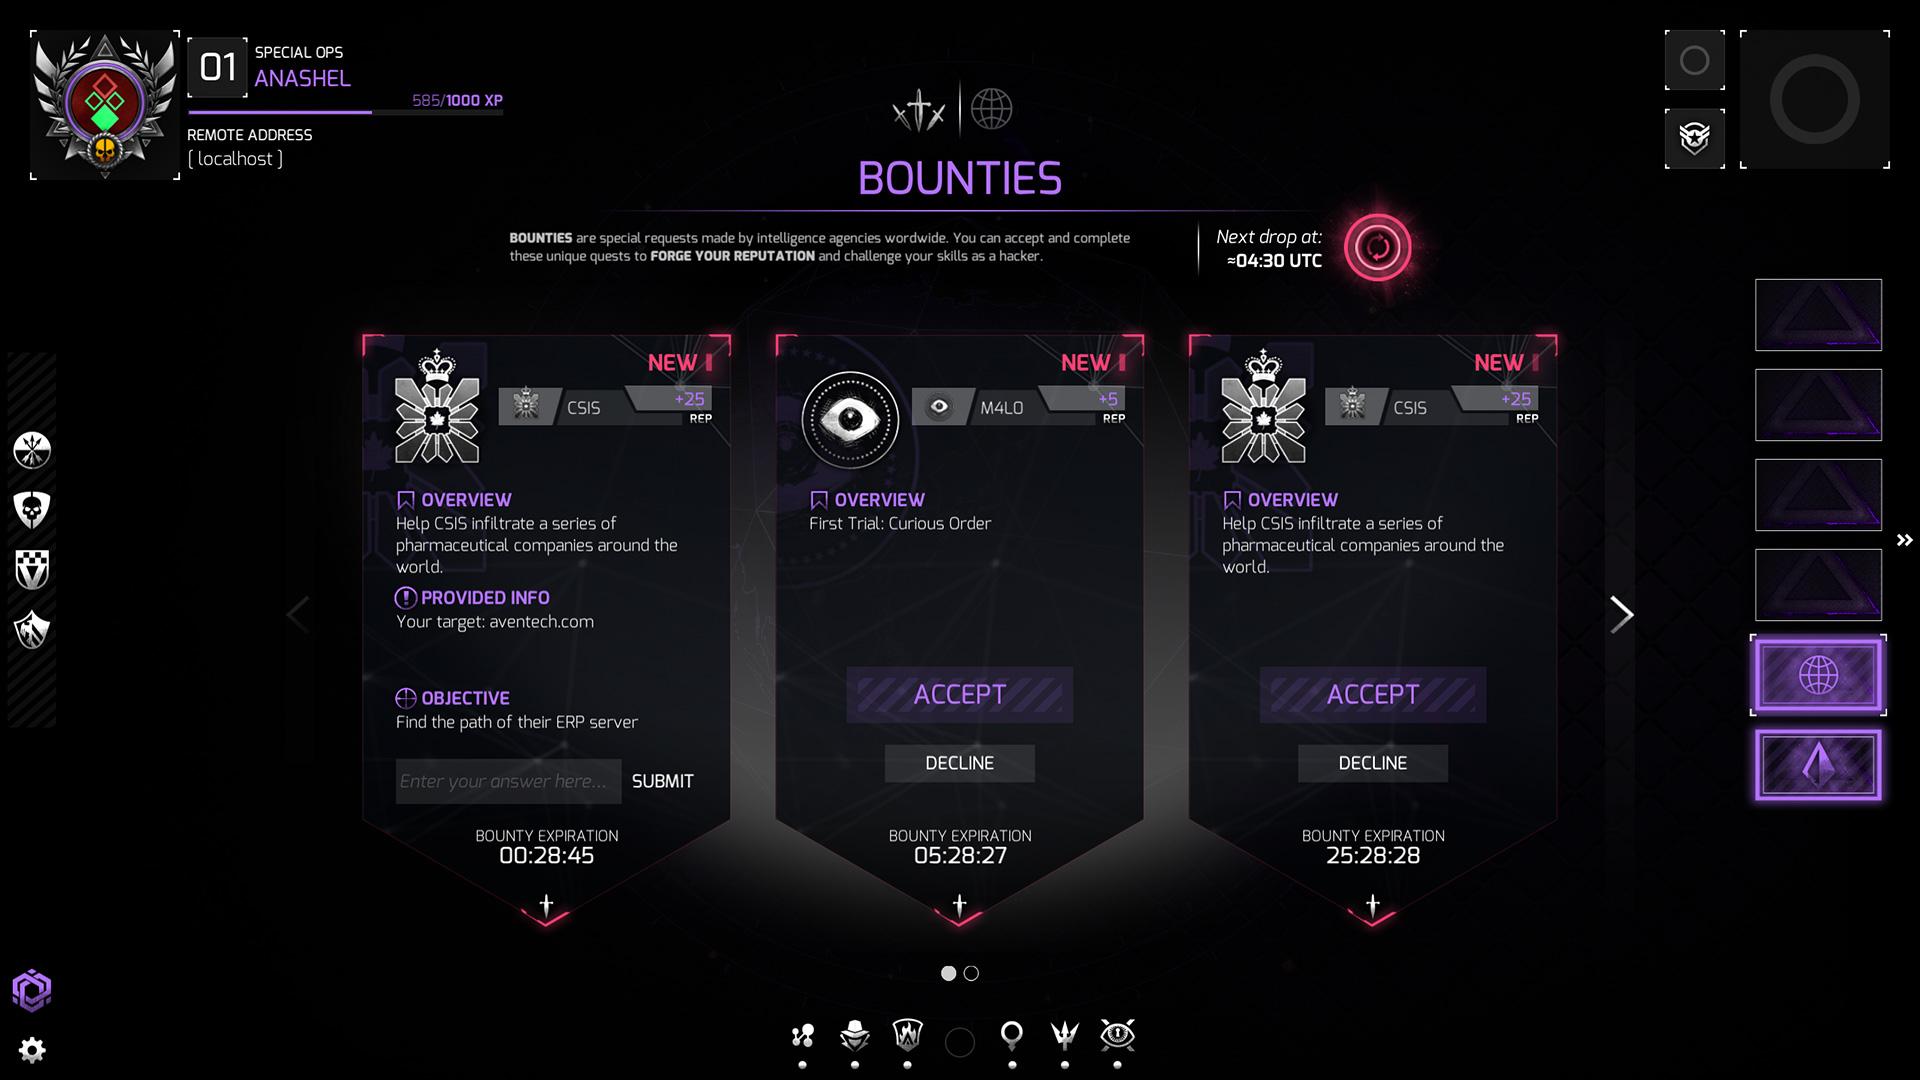 NITE Team 4 - Military Hacking Division